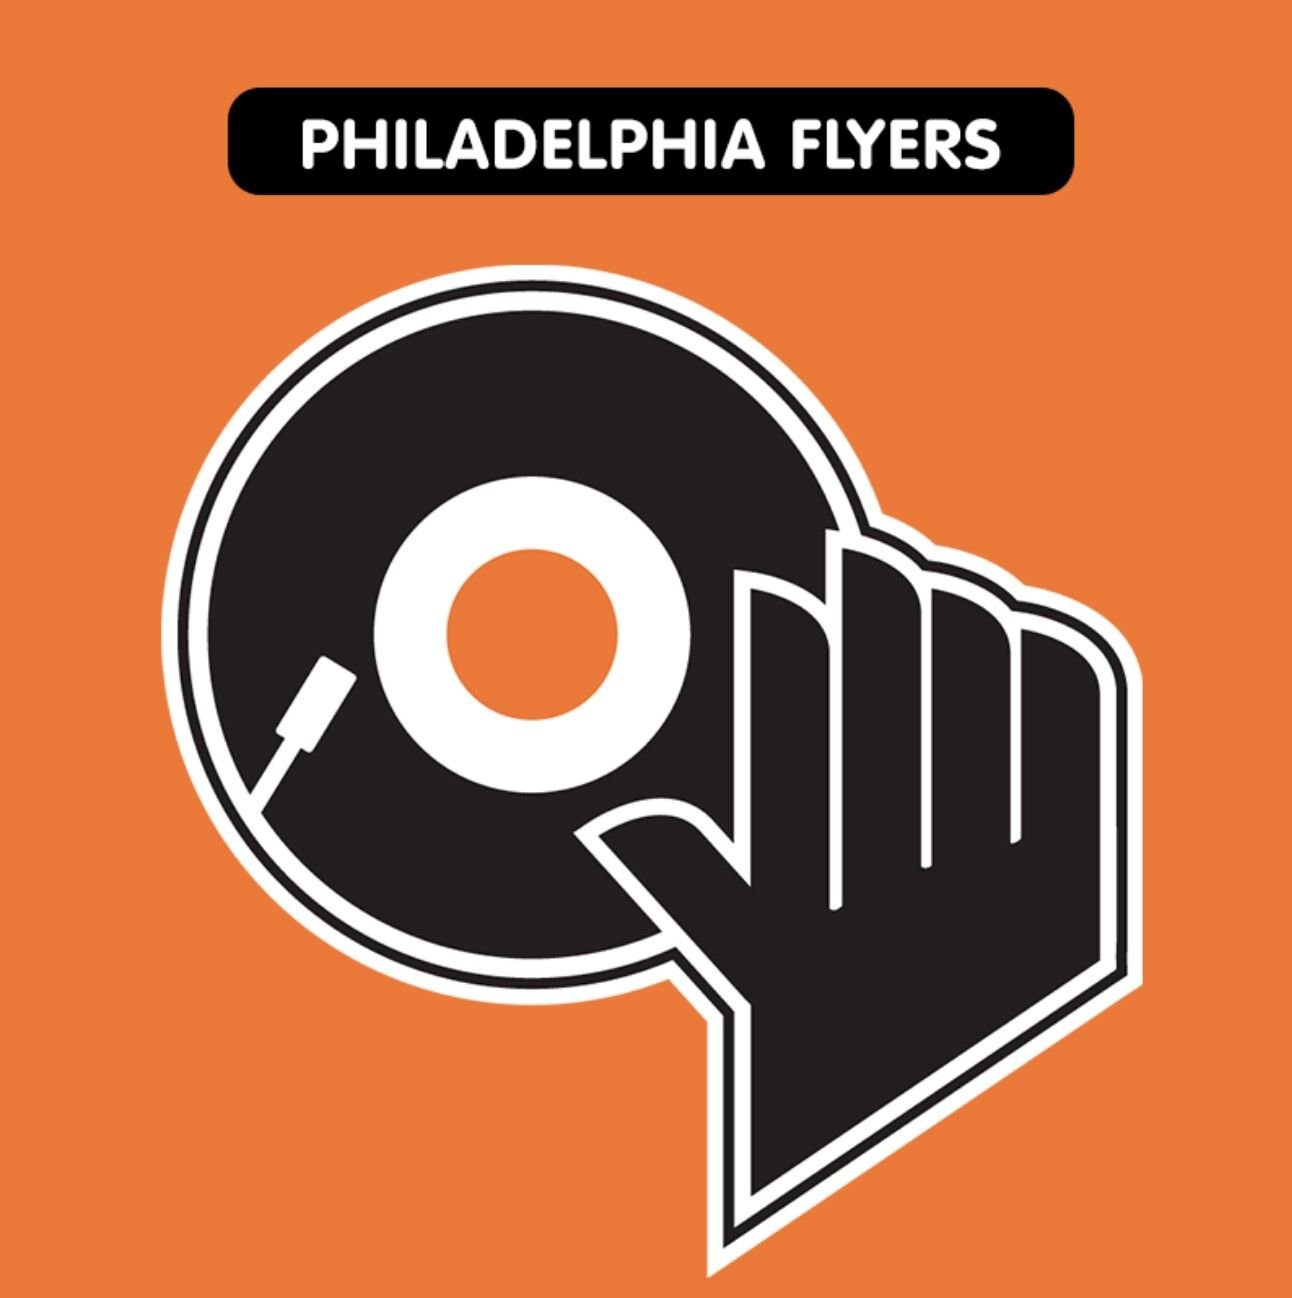 Philadelphia Flyers Nhl logos, Sports team logos, Logos